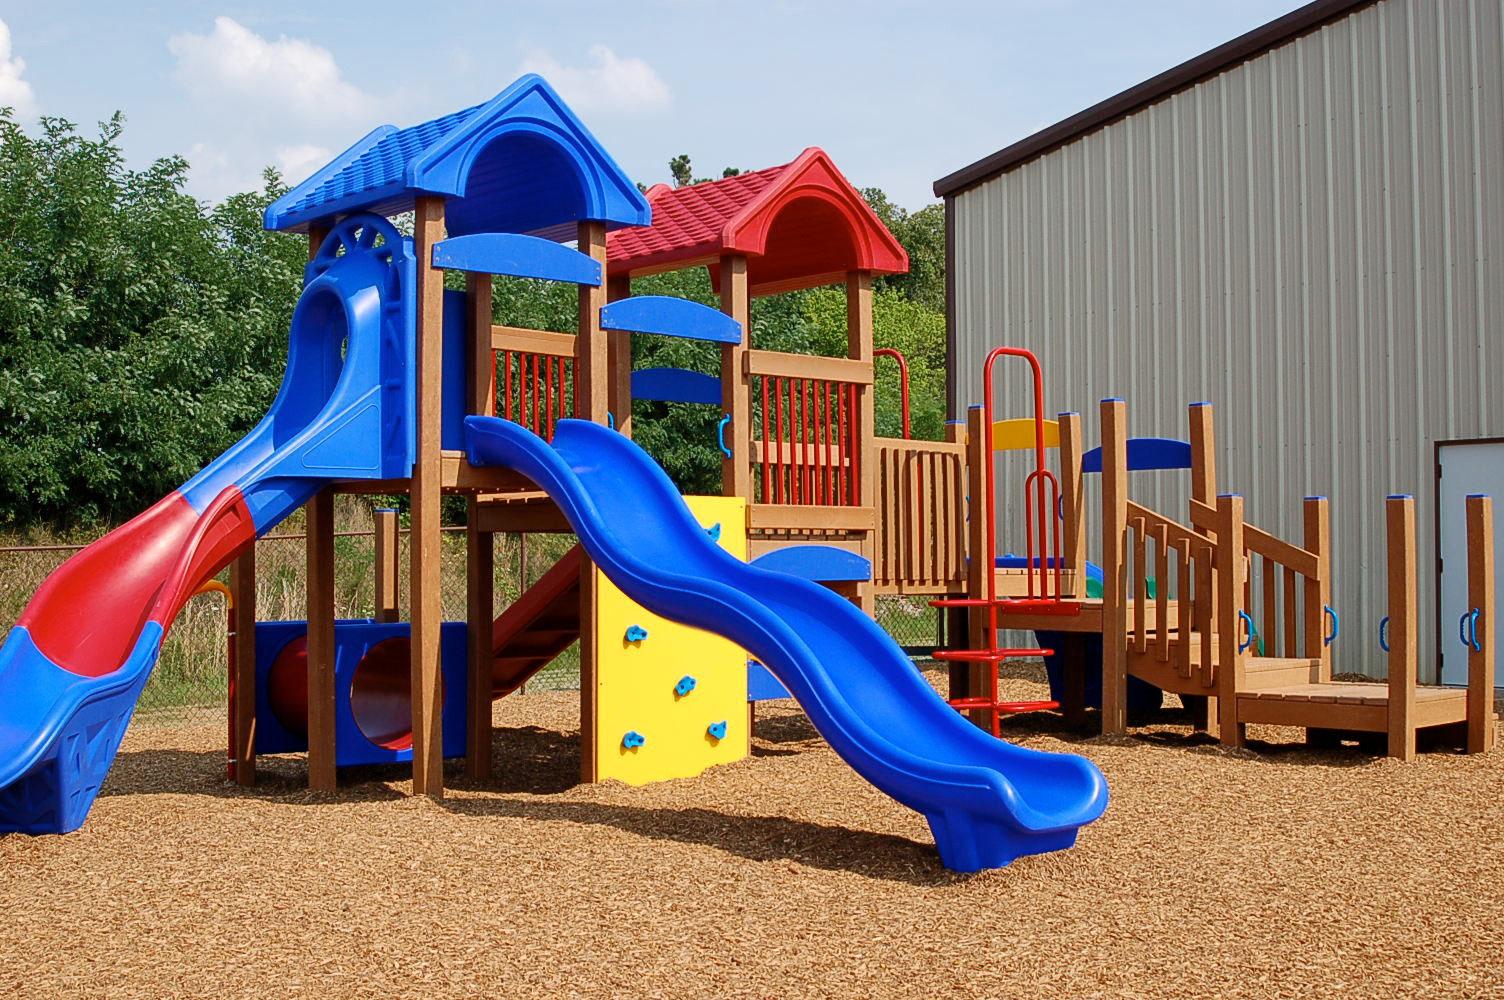 Parques infantiles ecol gicos y mobiliario p gina web de - Construir parque infantil ...